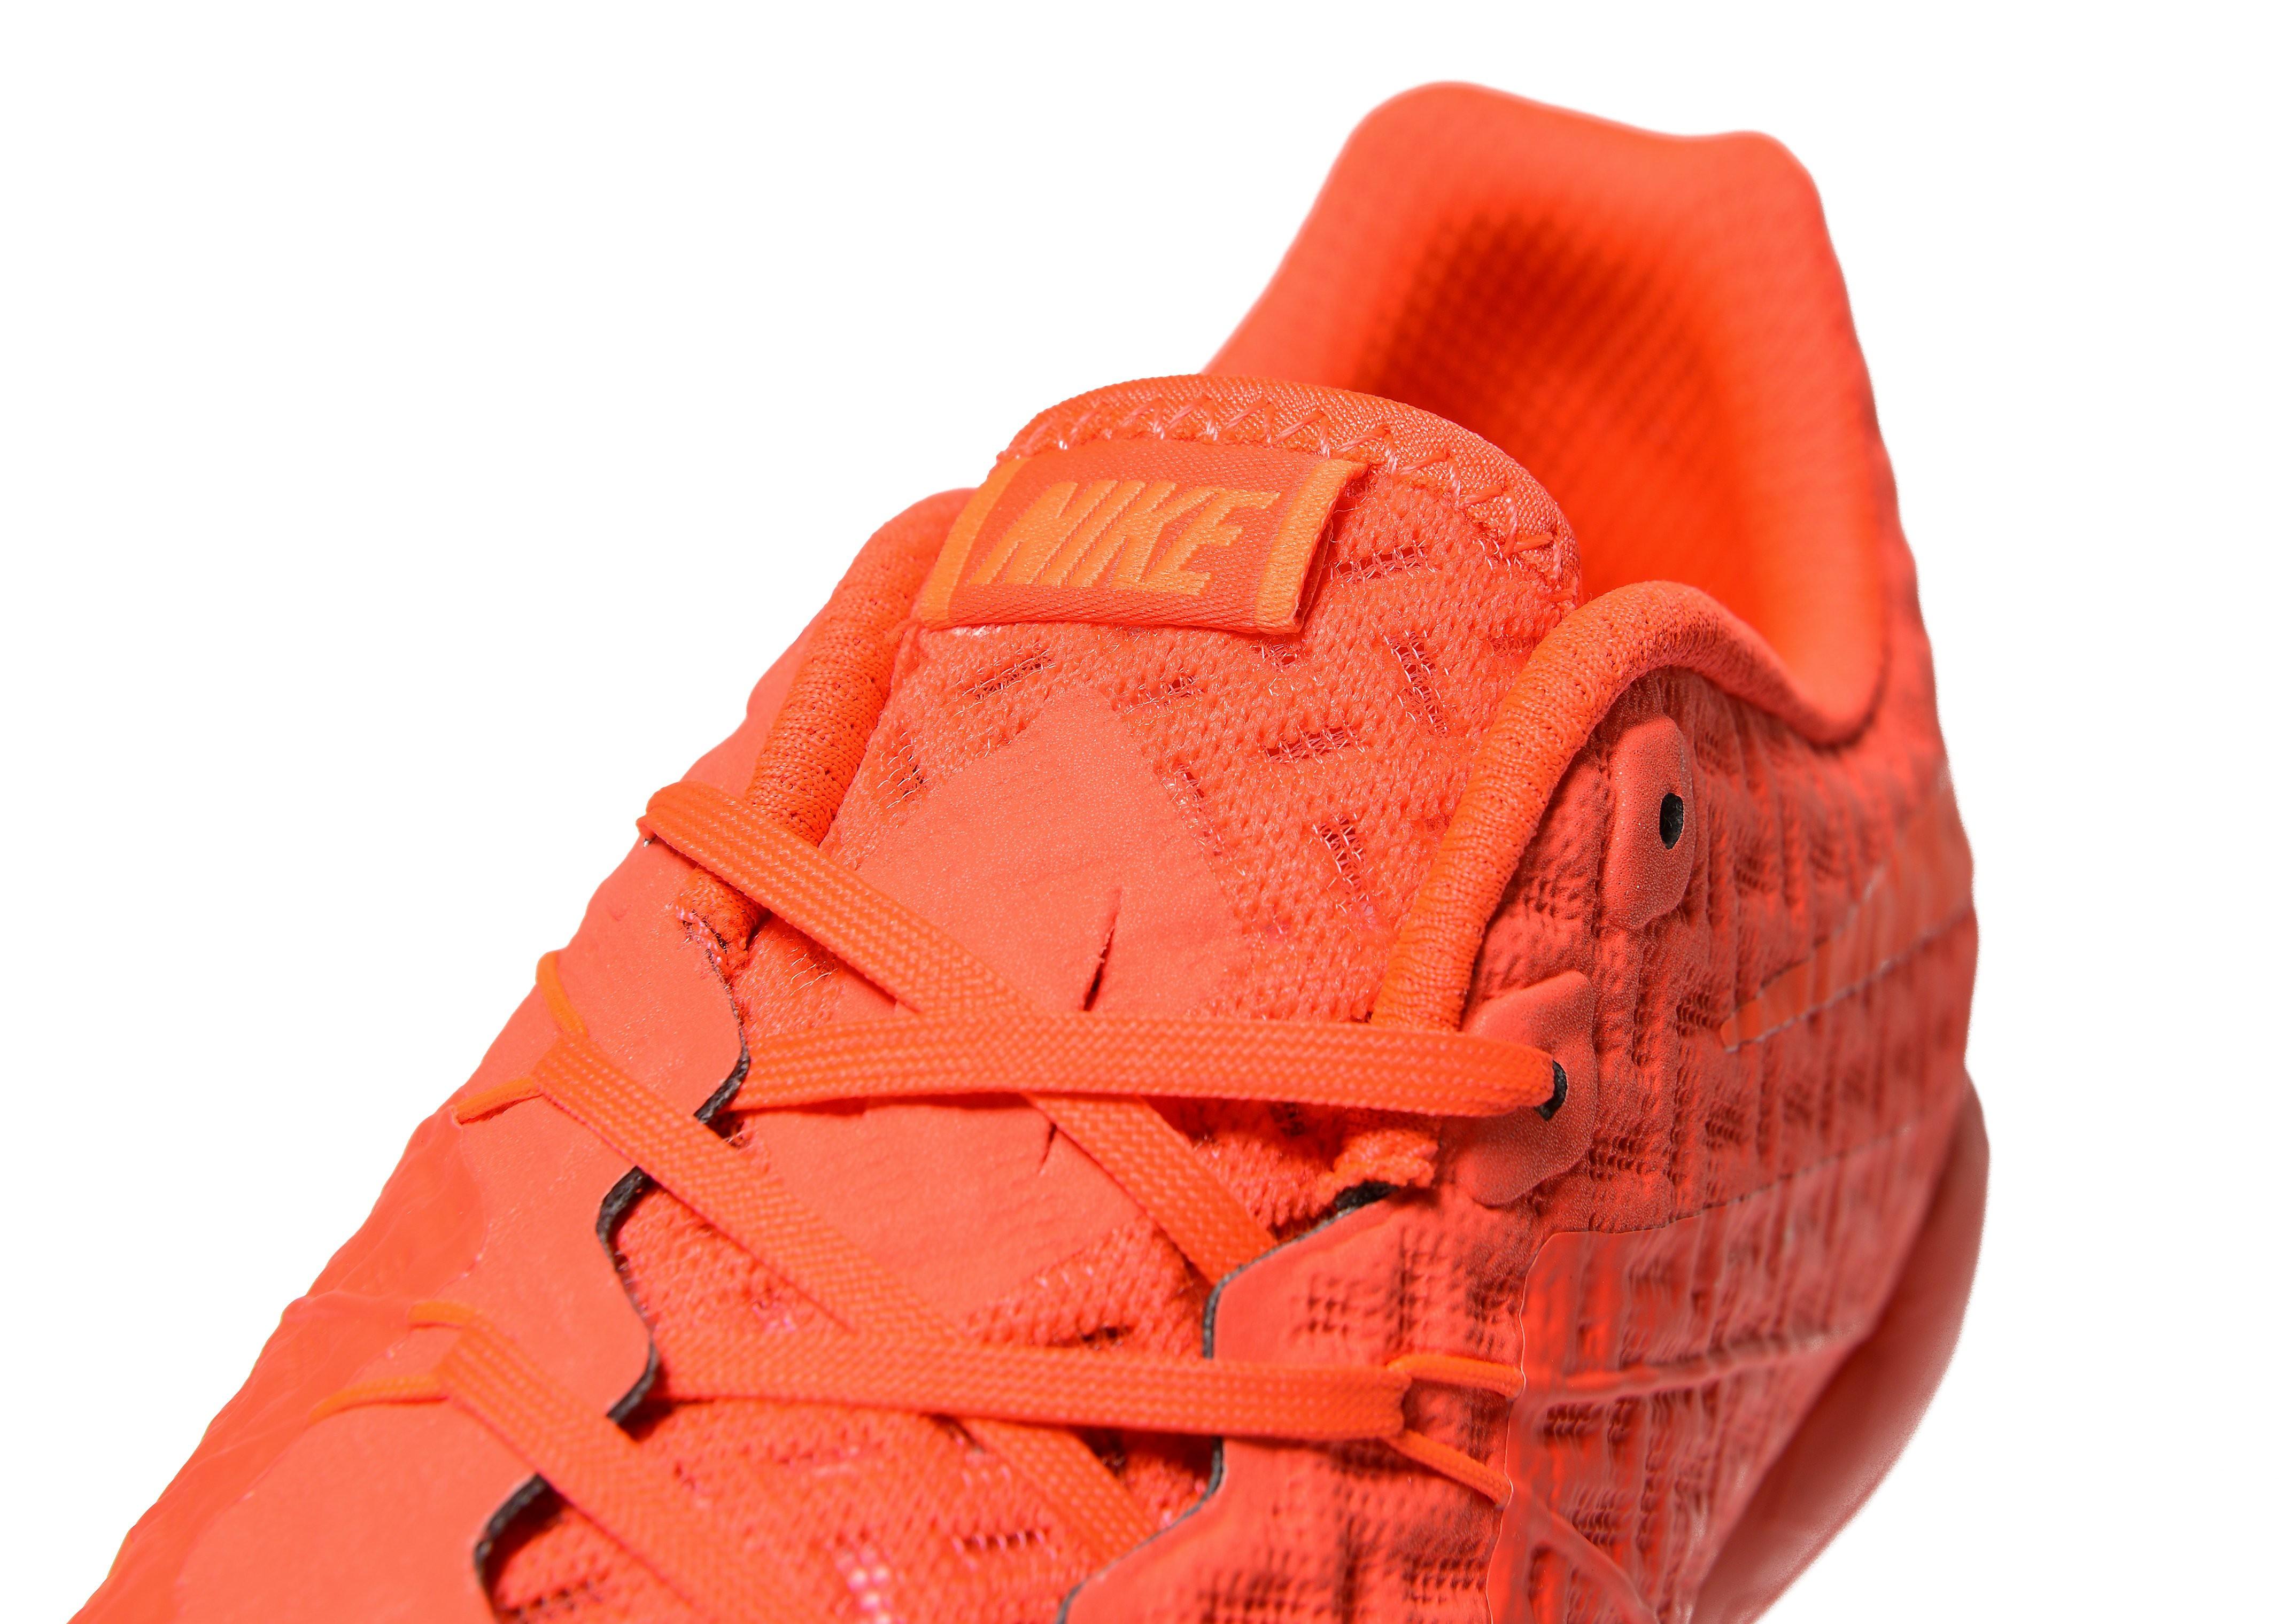 Nike Football X Glow HypervenomX Phelon II Turf